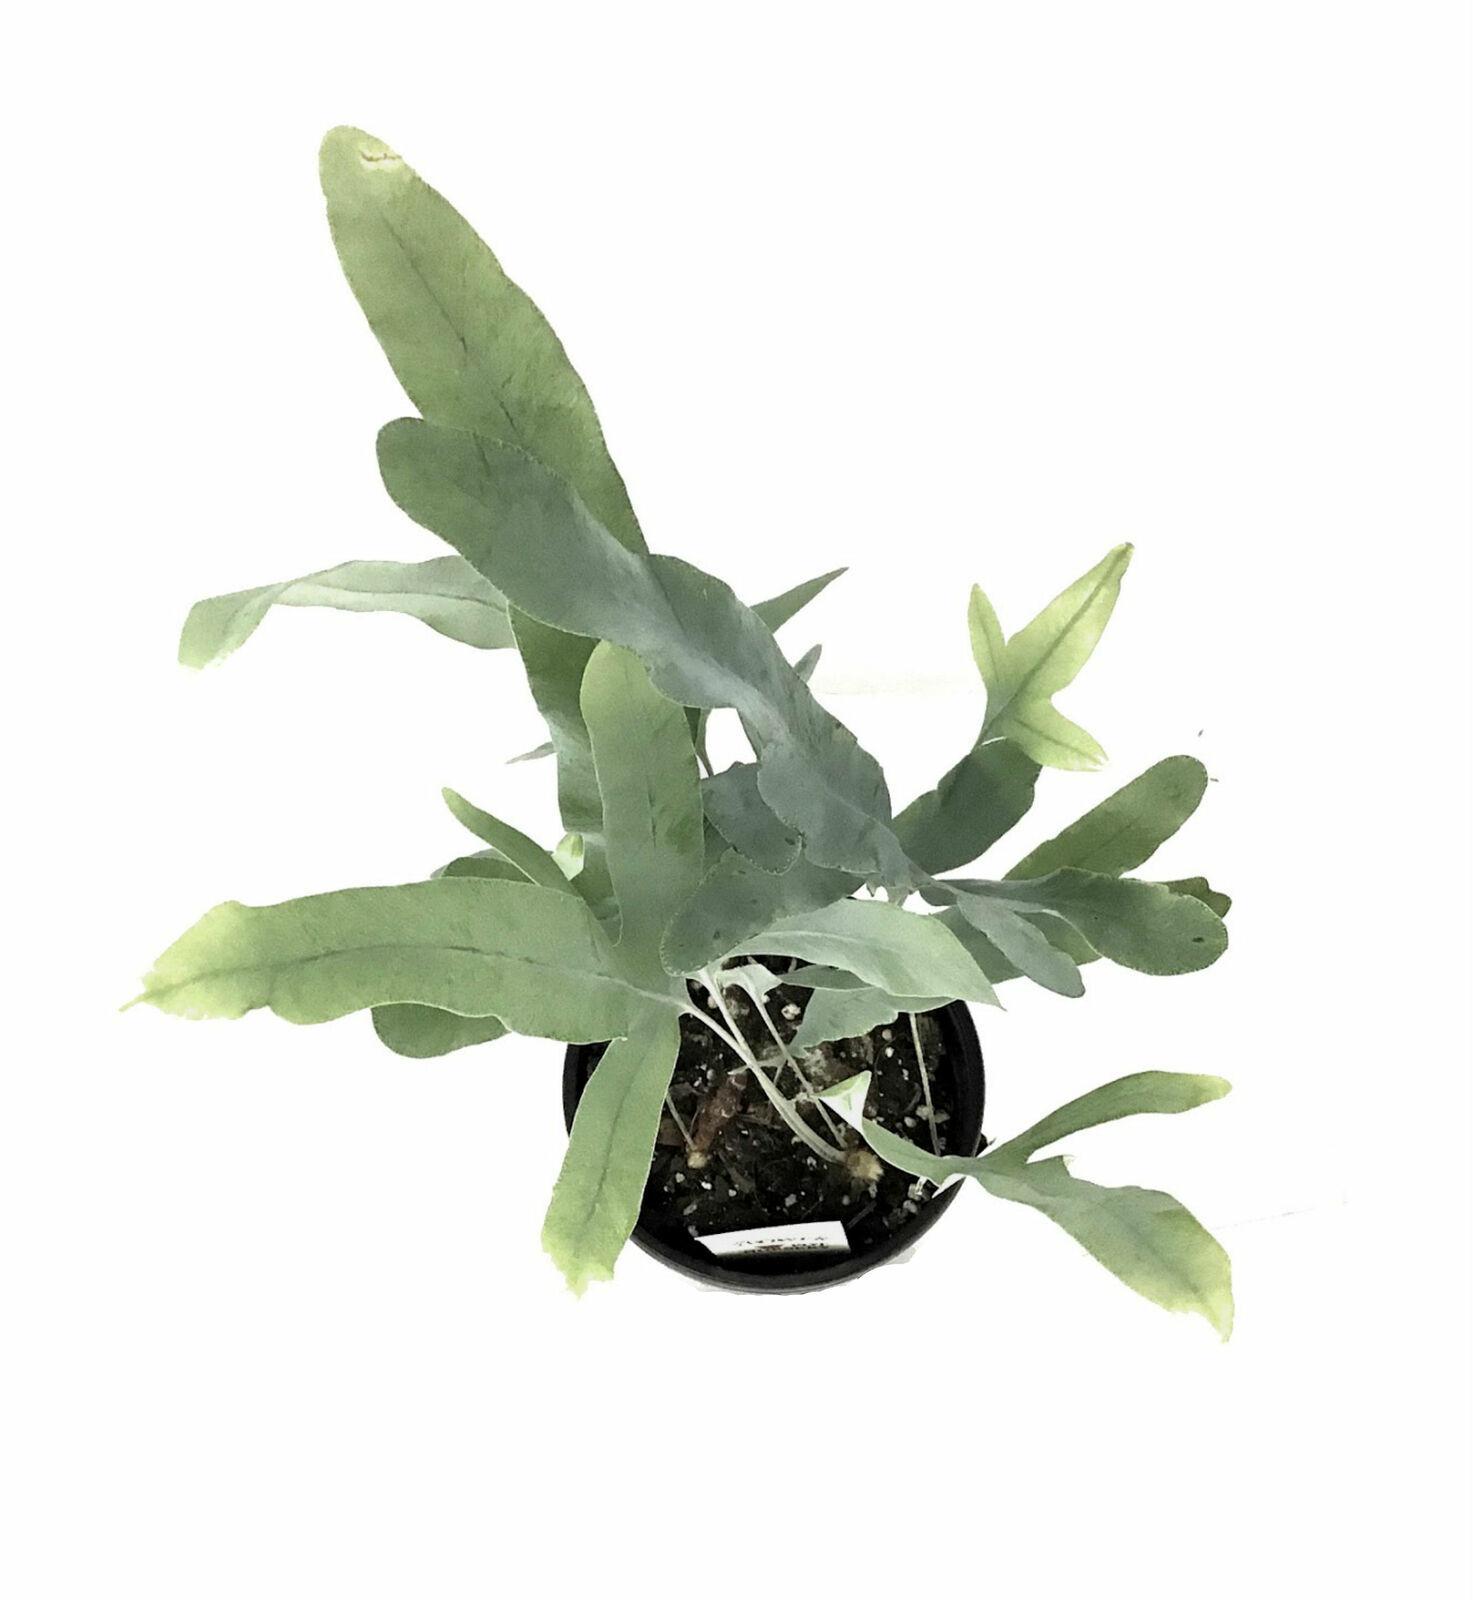 "4"" Pot VirginiaBlue Fern Polypodium pseudo-aureum Virginia Blue - FREESHIPPING - $42.00"